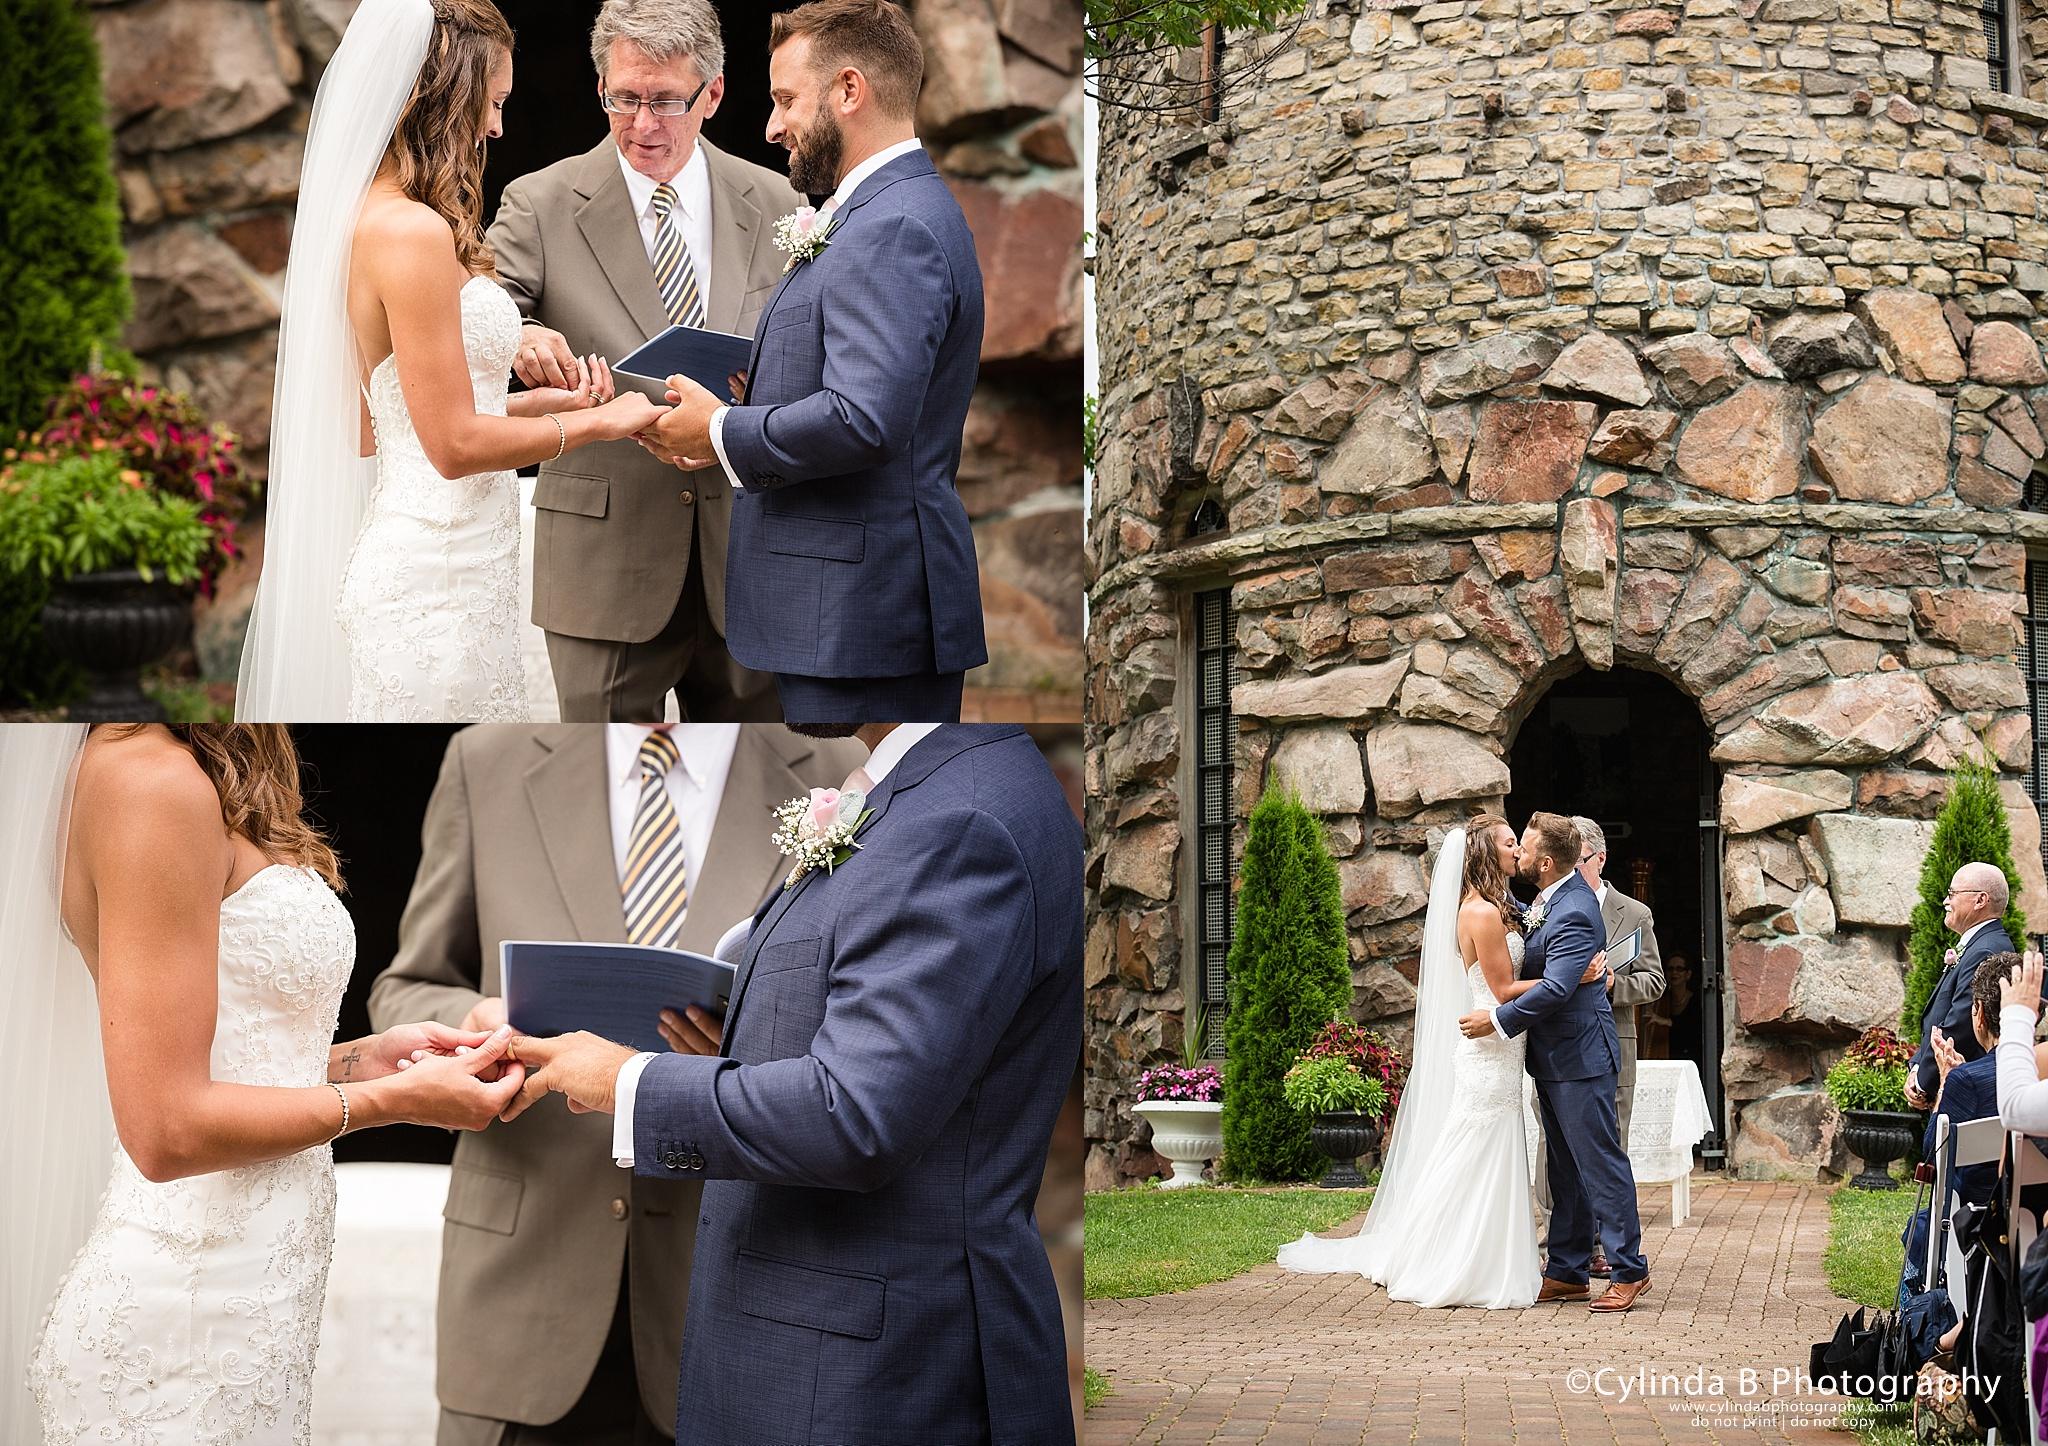 Boldt Castle Wedding, Alexandria Bay, Wedding, Photograper, Cylinda B Photography-23